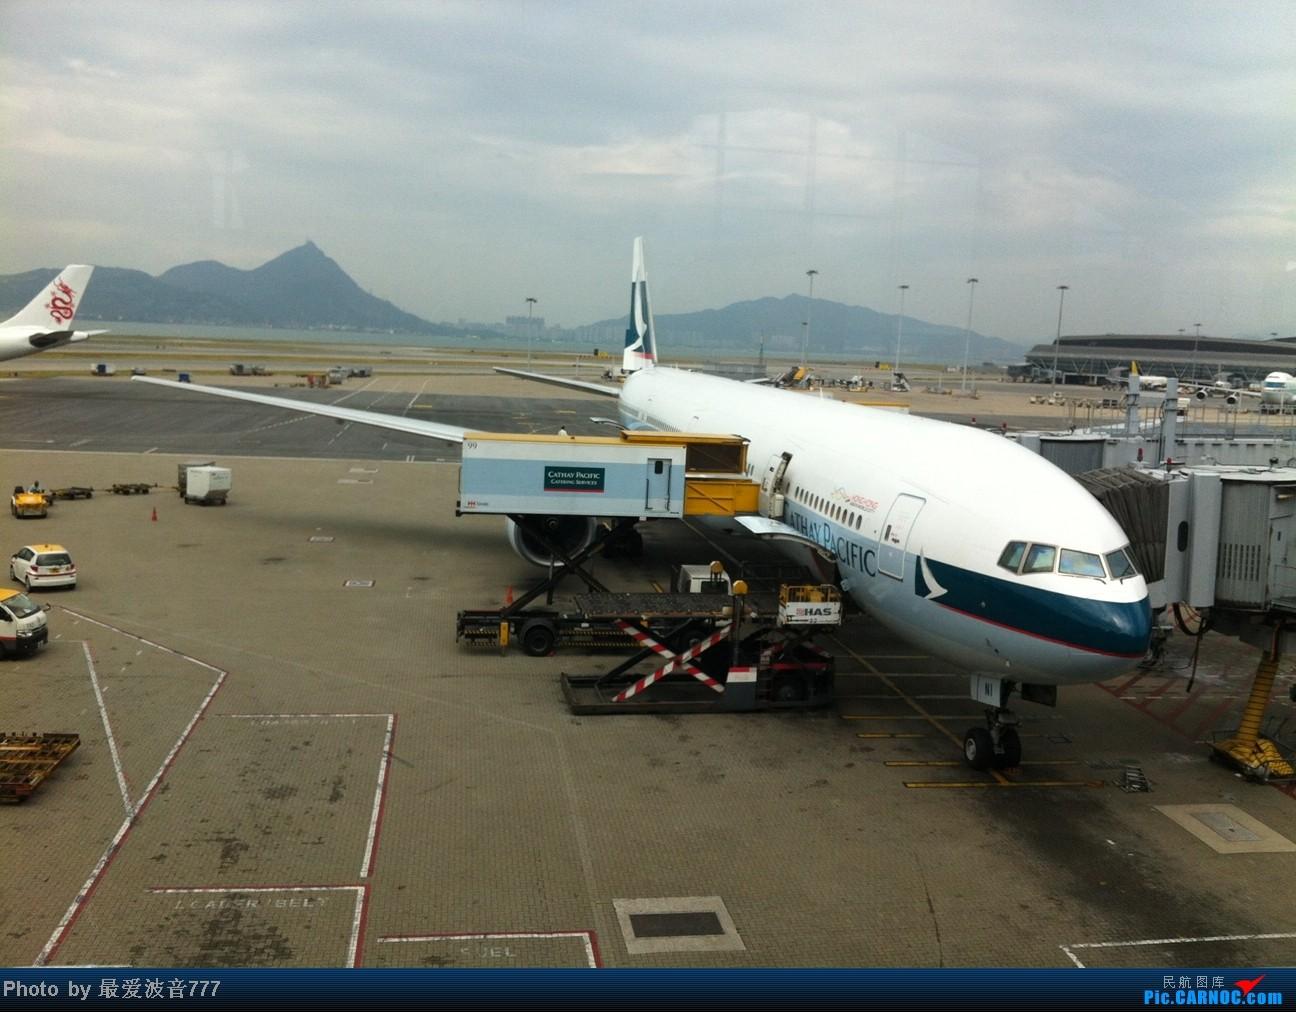 Re:[原创]假期的回国往返之旅 LHR-HKG-CTU-HKG-LHR, CX+CA+KA联合运营 BOEING 777-300 B-HNI 中国香港赤鱲角国际机场